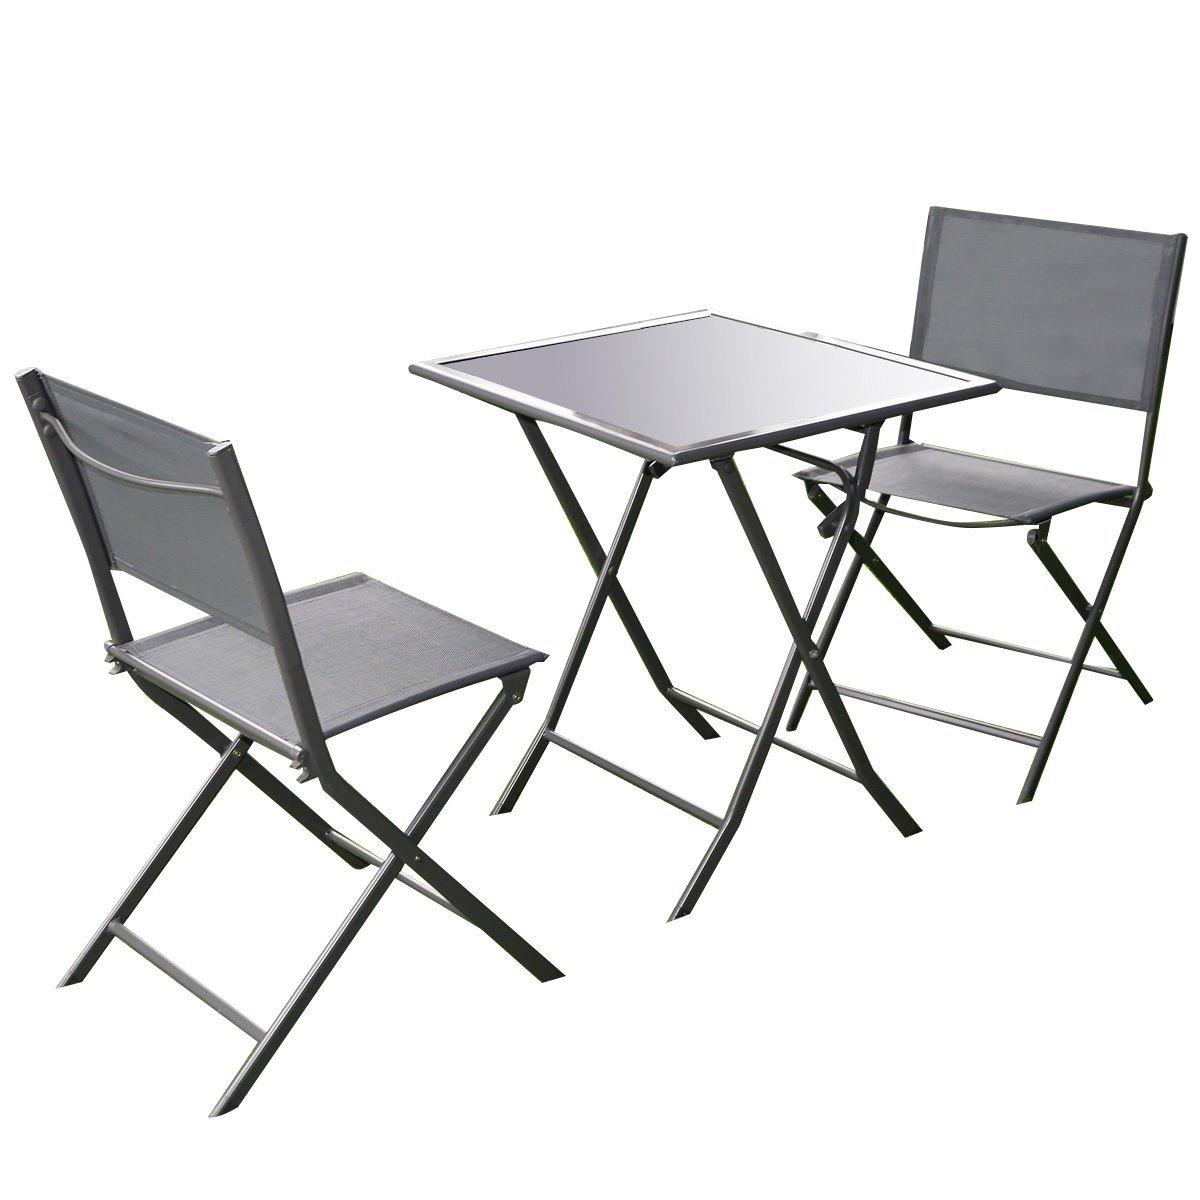 1200x1200 Giantex 3 Pcs Bistro Set Garden Backyard Table Chairs